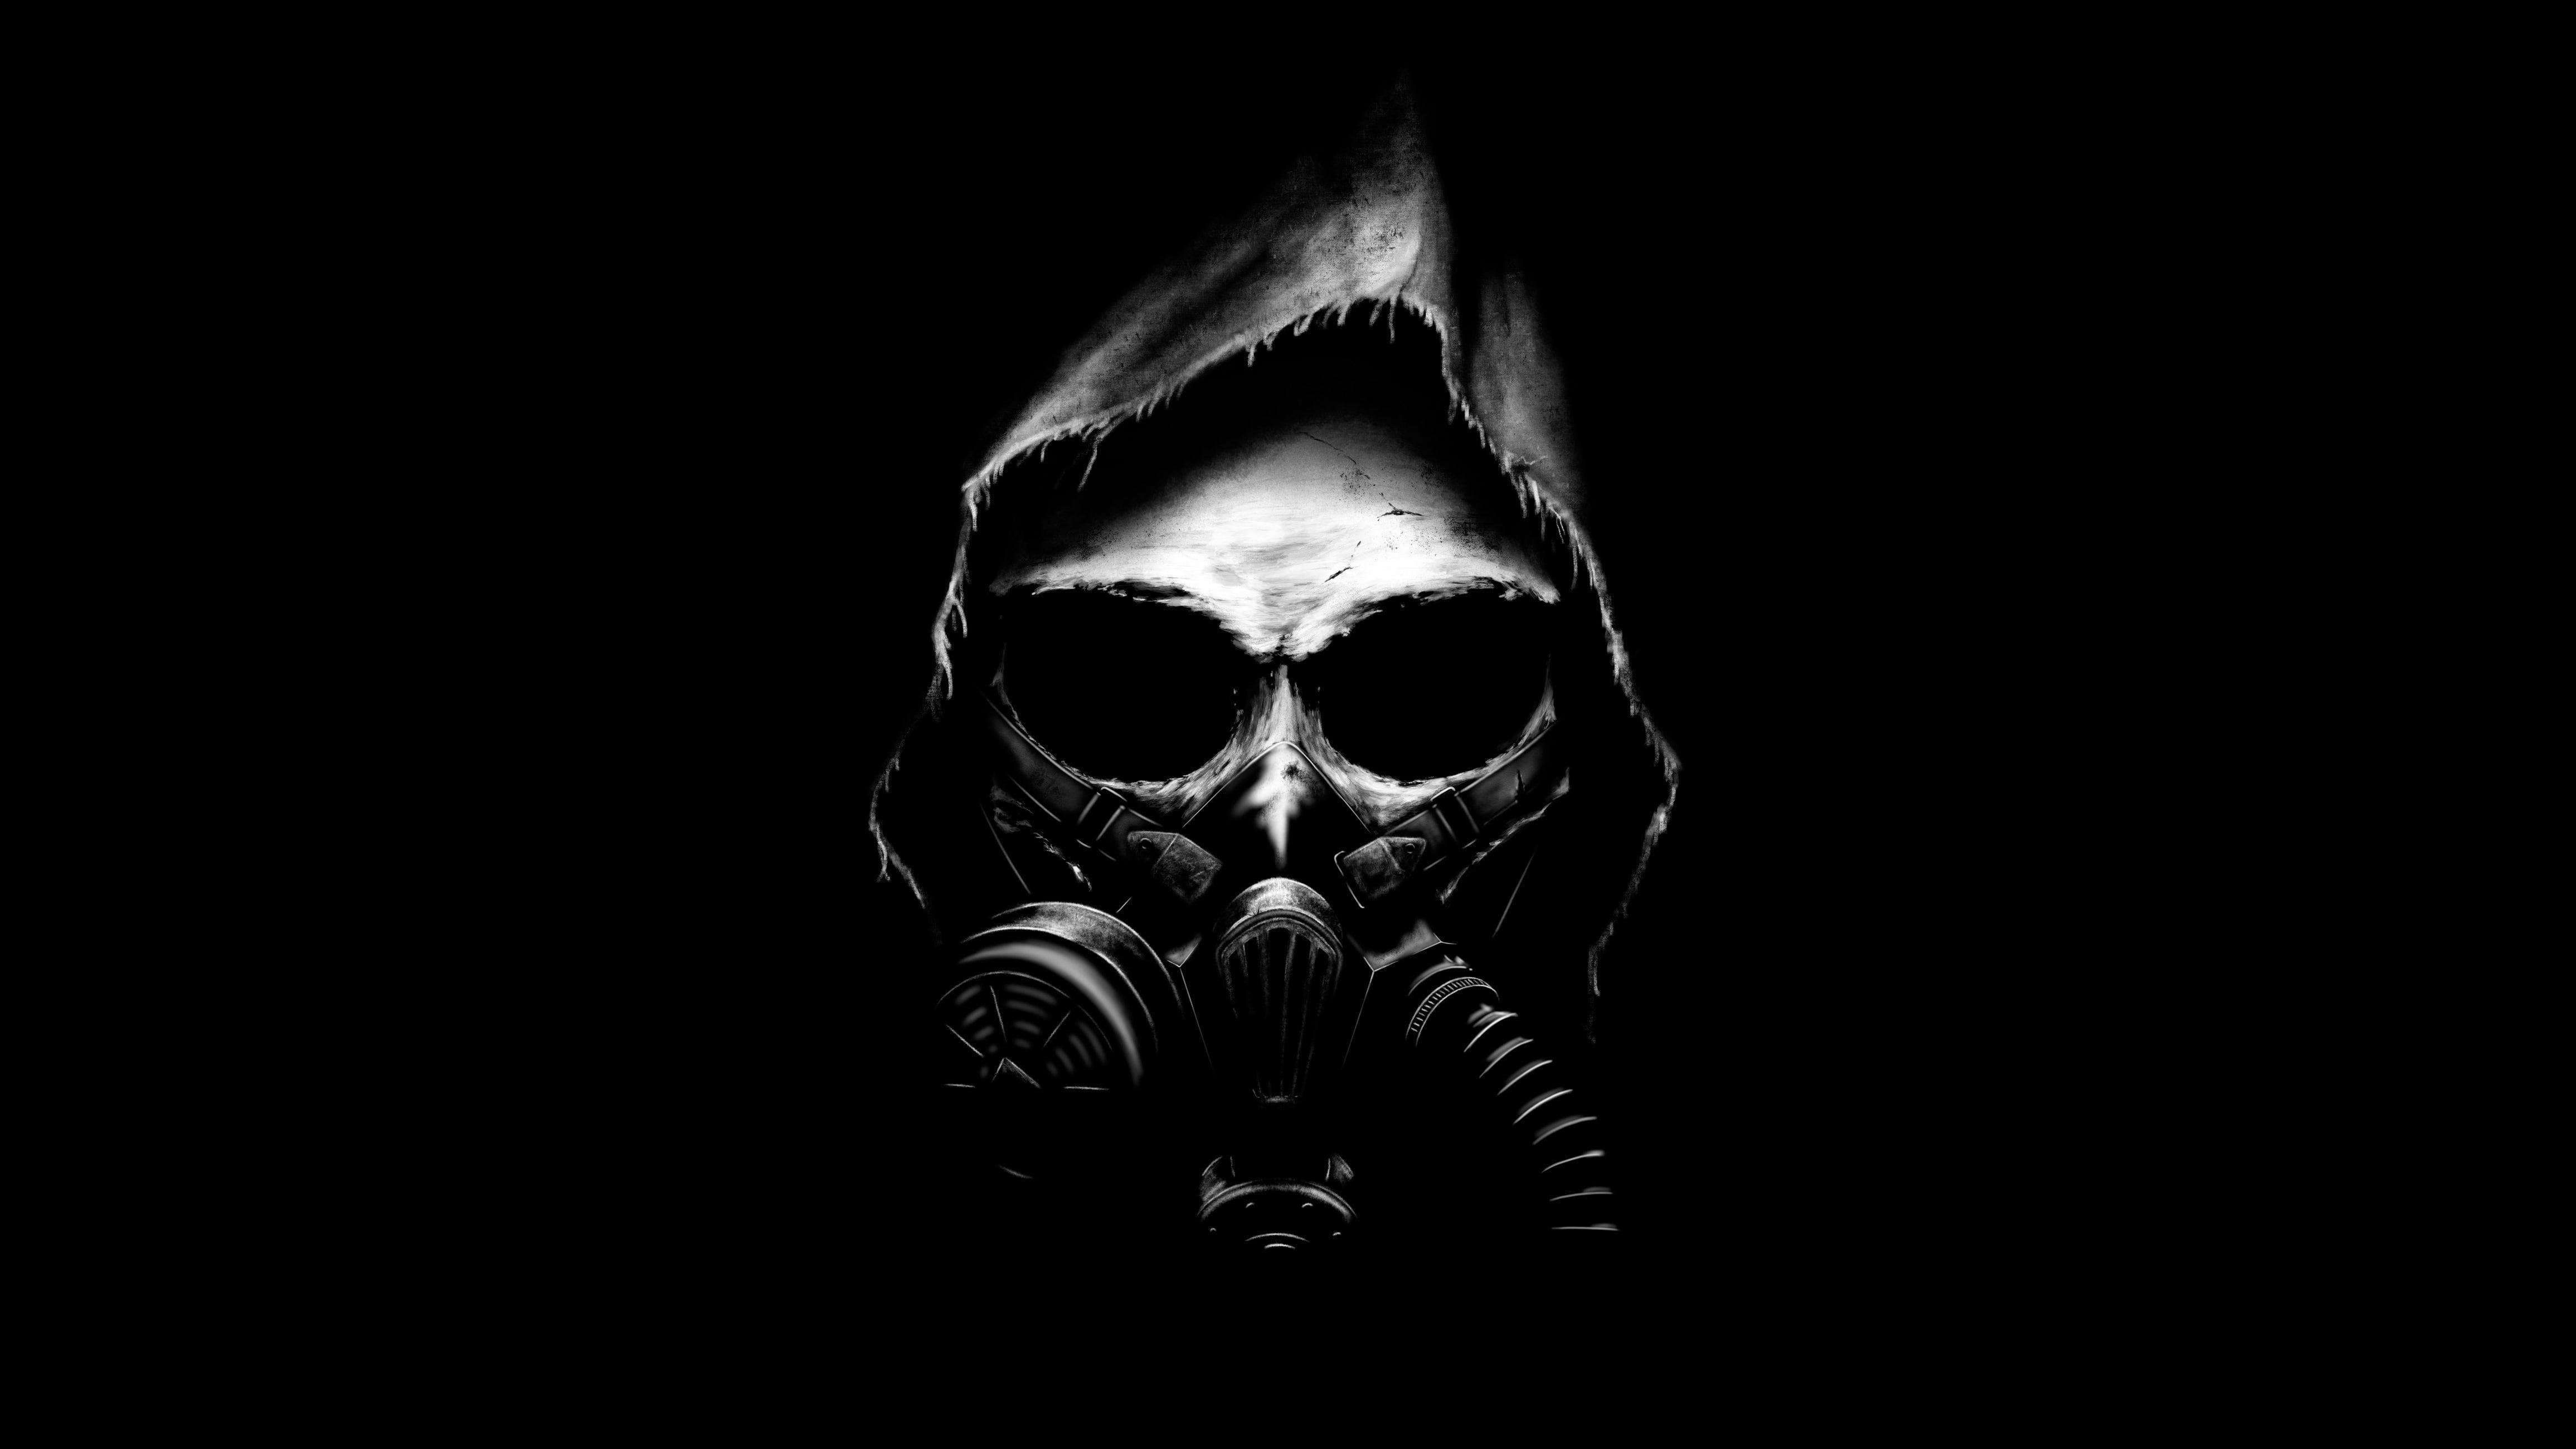 4k Apocalypse Dark Background Black Minimal Gas Mask Skull 4k Wallpaper Hdwallpaper Desktop In 2020 Skull Wallpaper Black Skulls Wallpaper Gas Mask